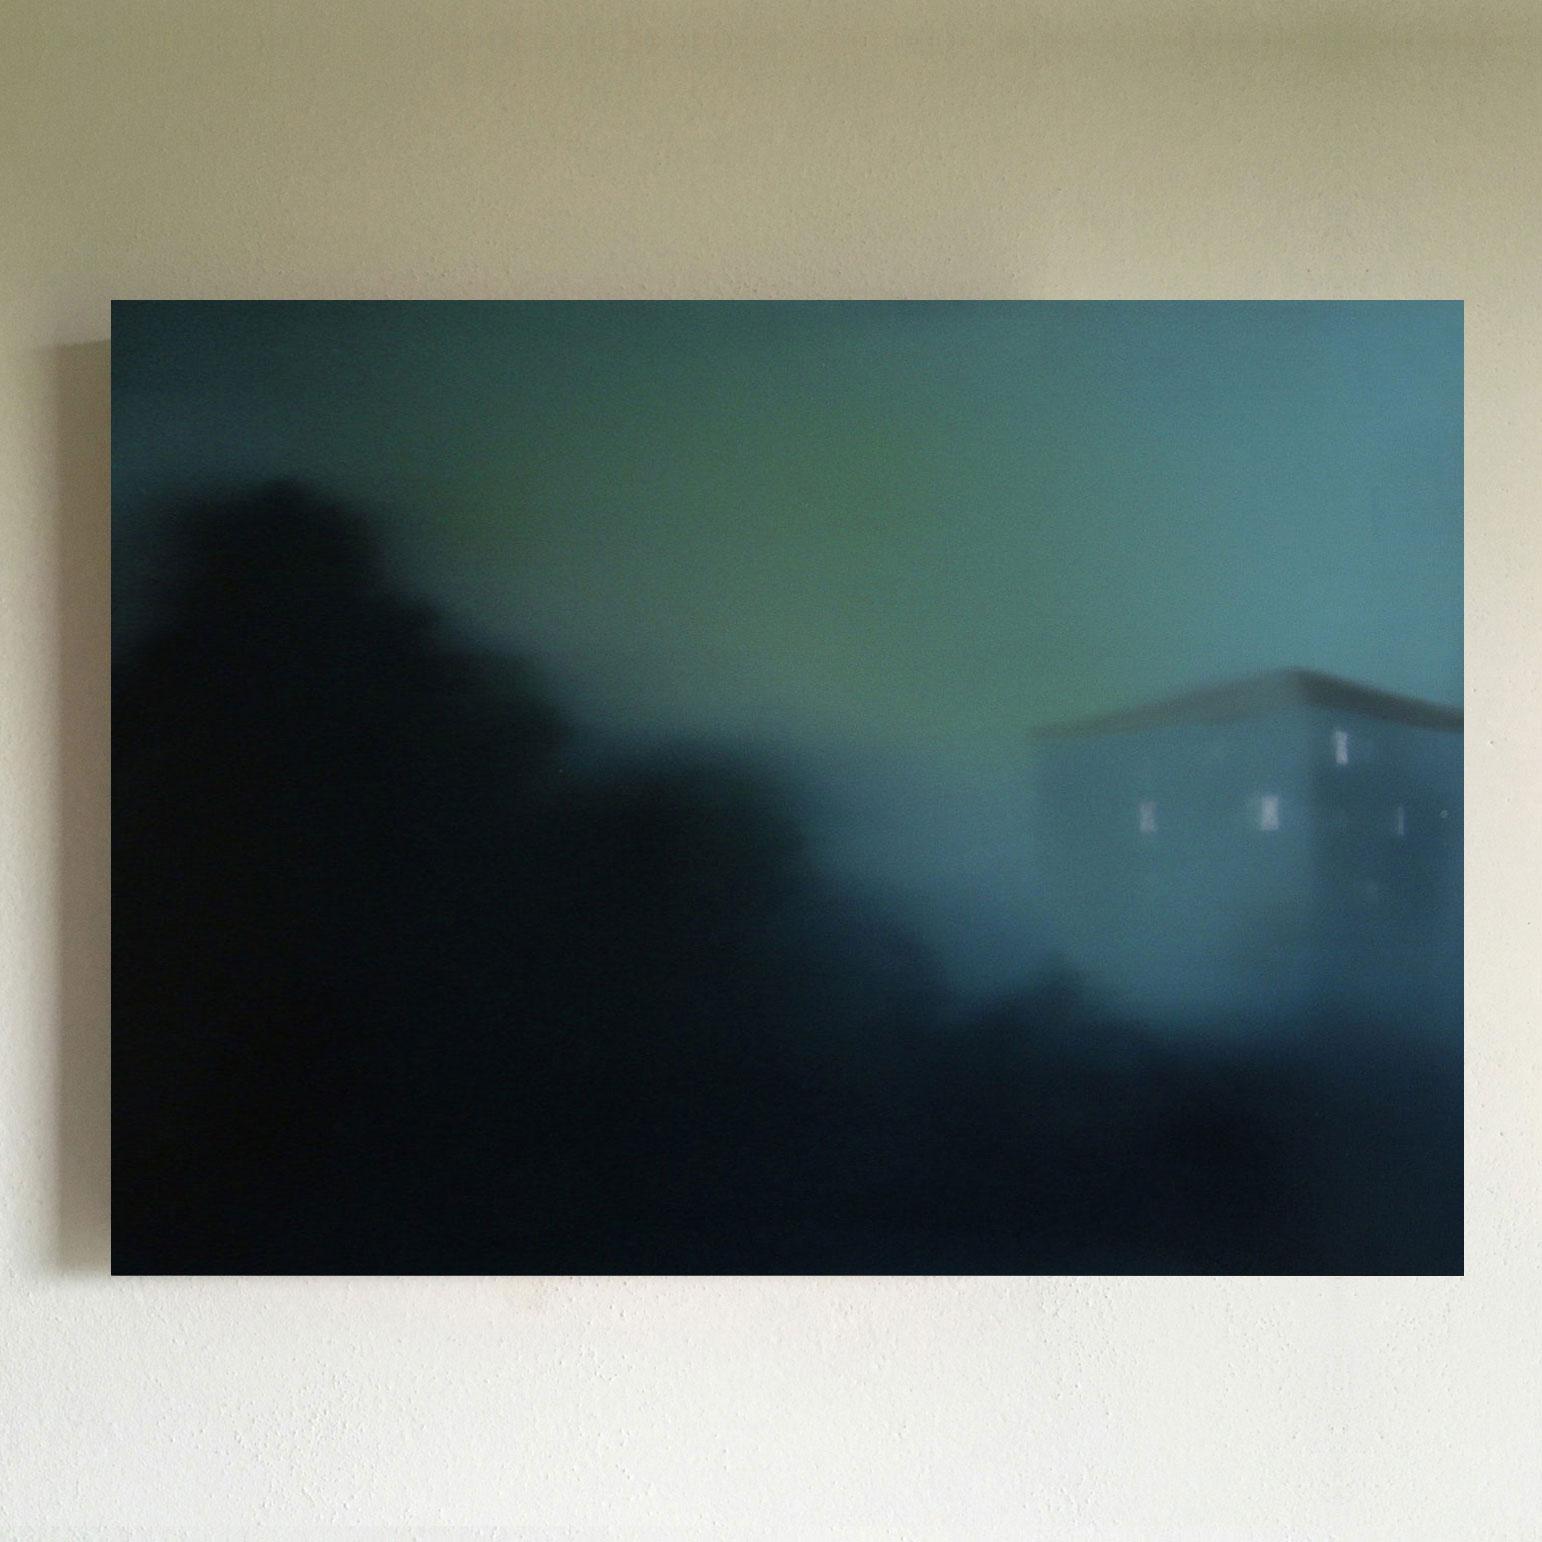 T#27-2009, oil on canvas, 80x120cm, private. coll.